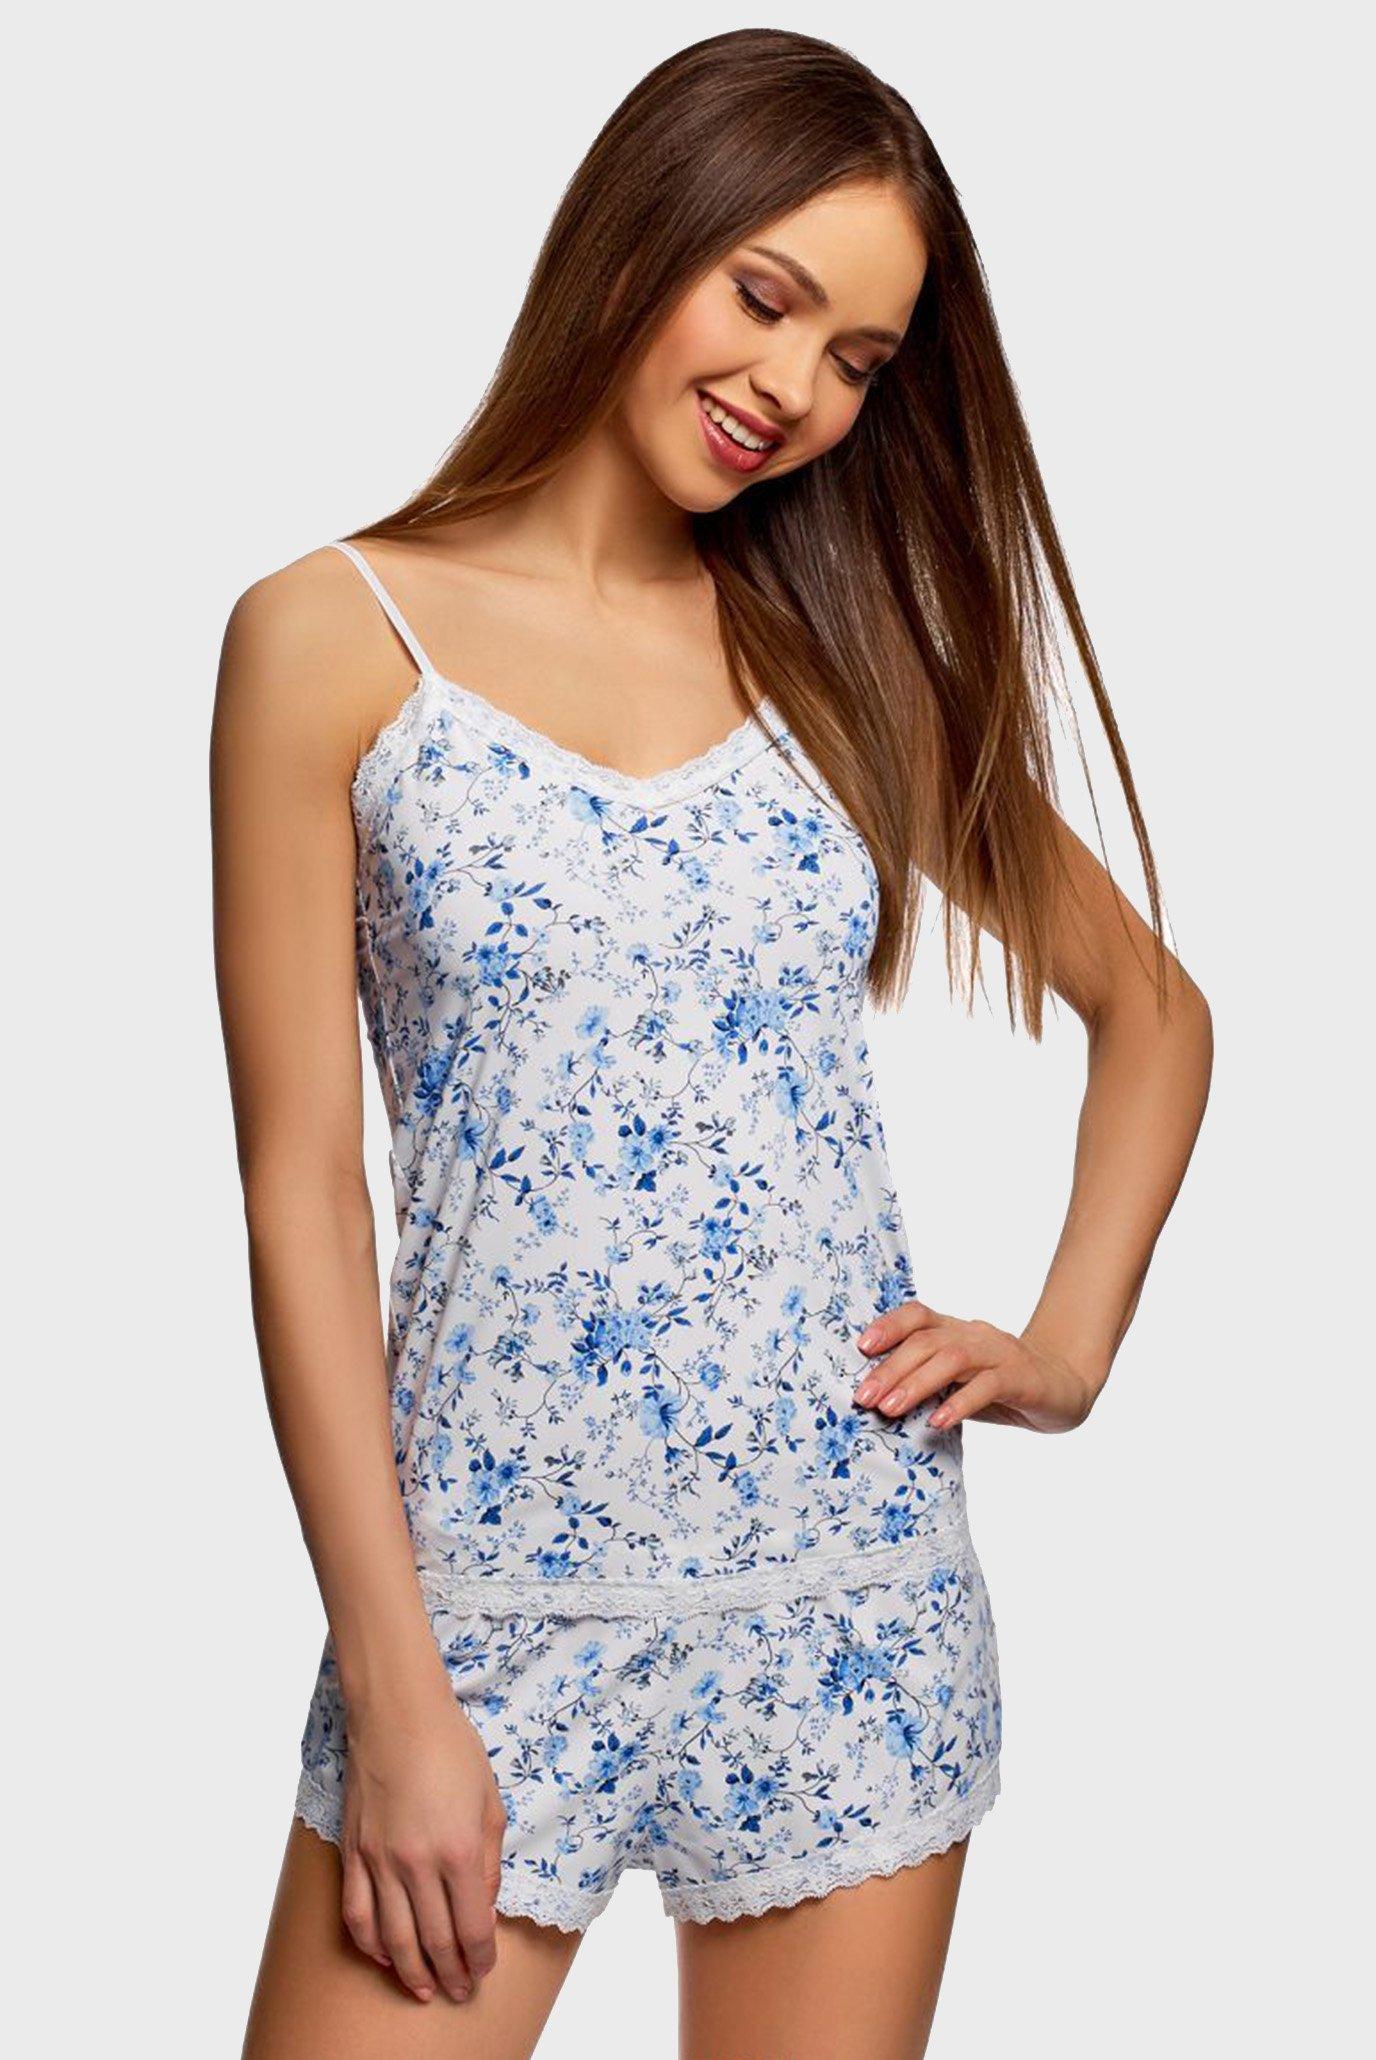 Женская белая пижама (майка, шорты) 1